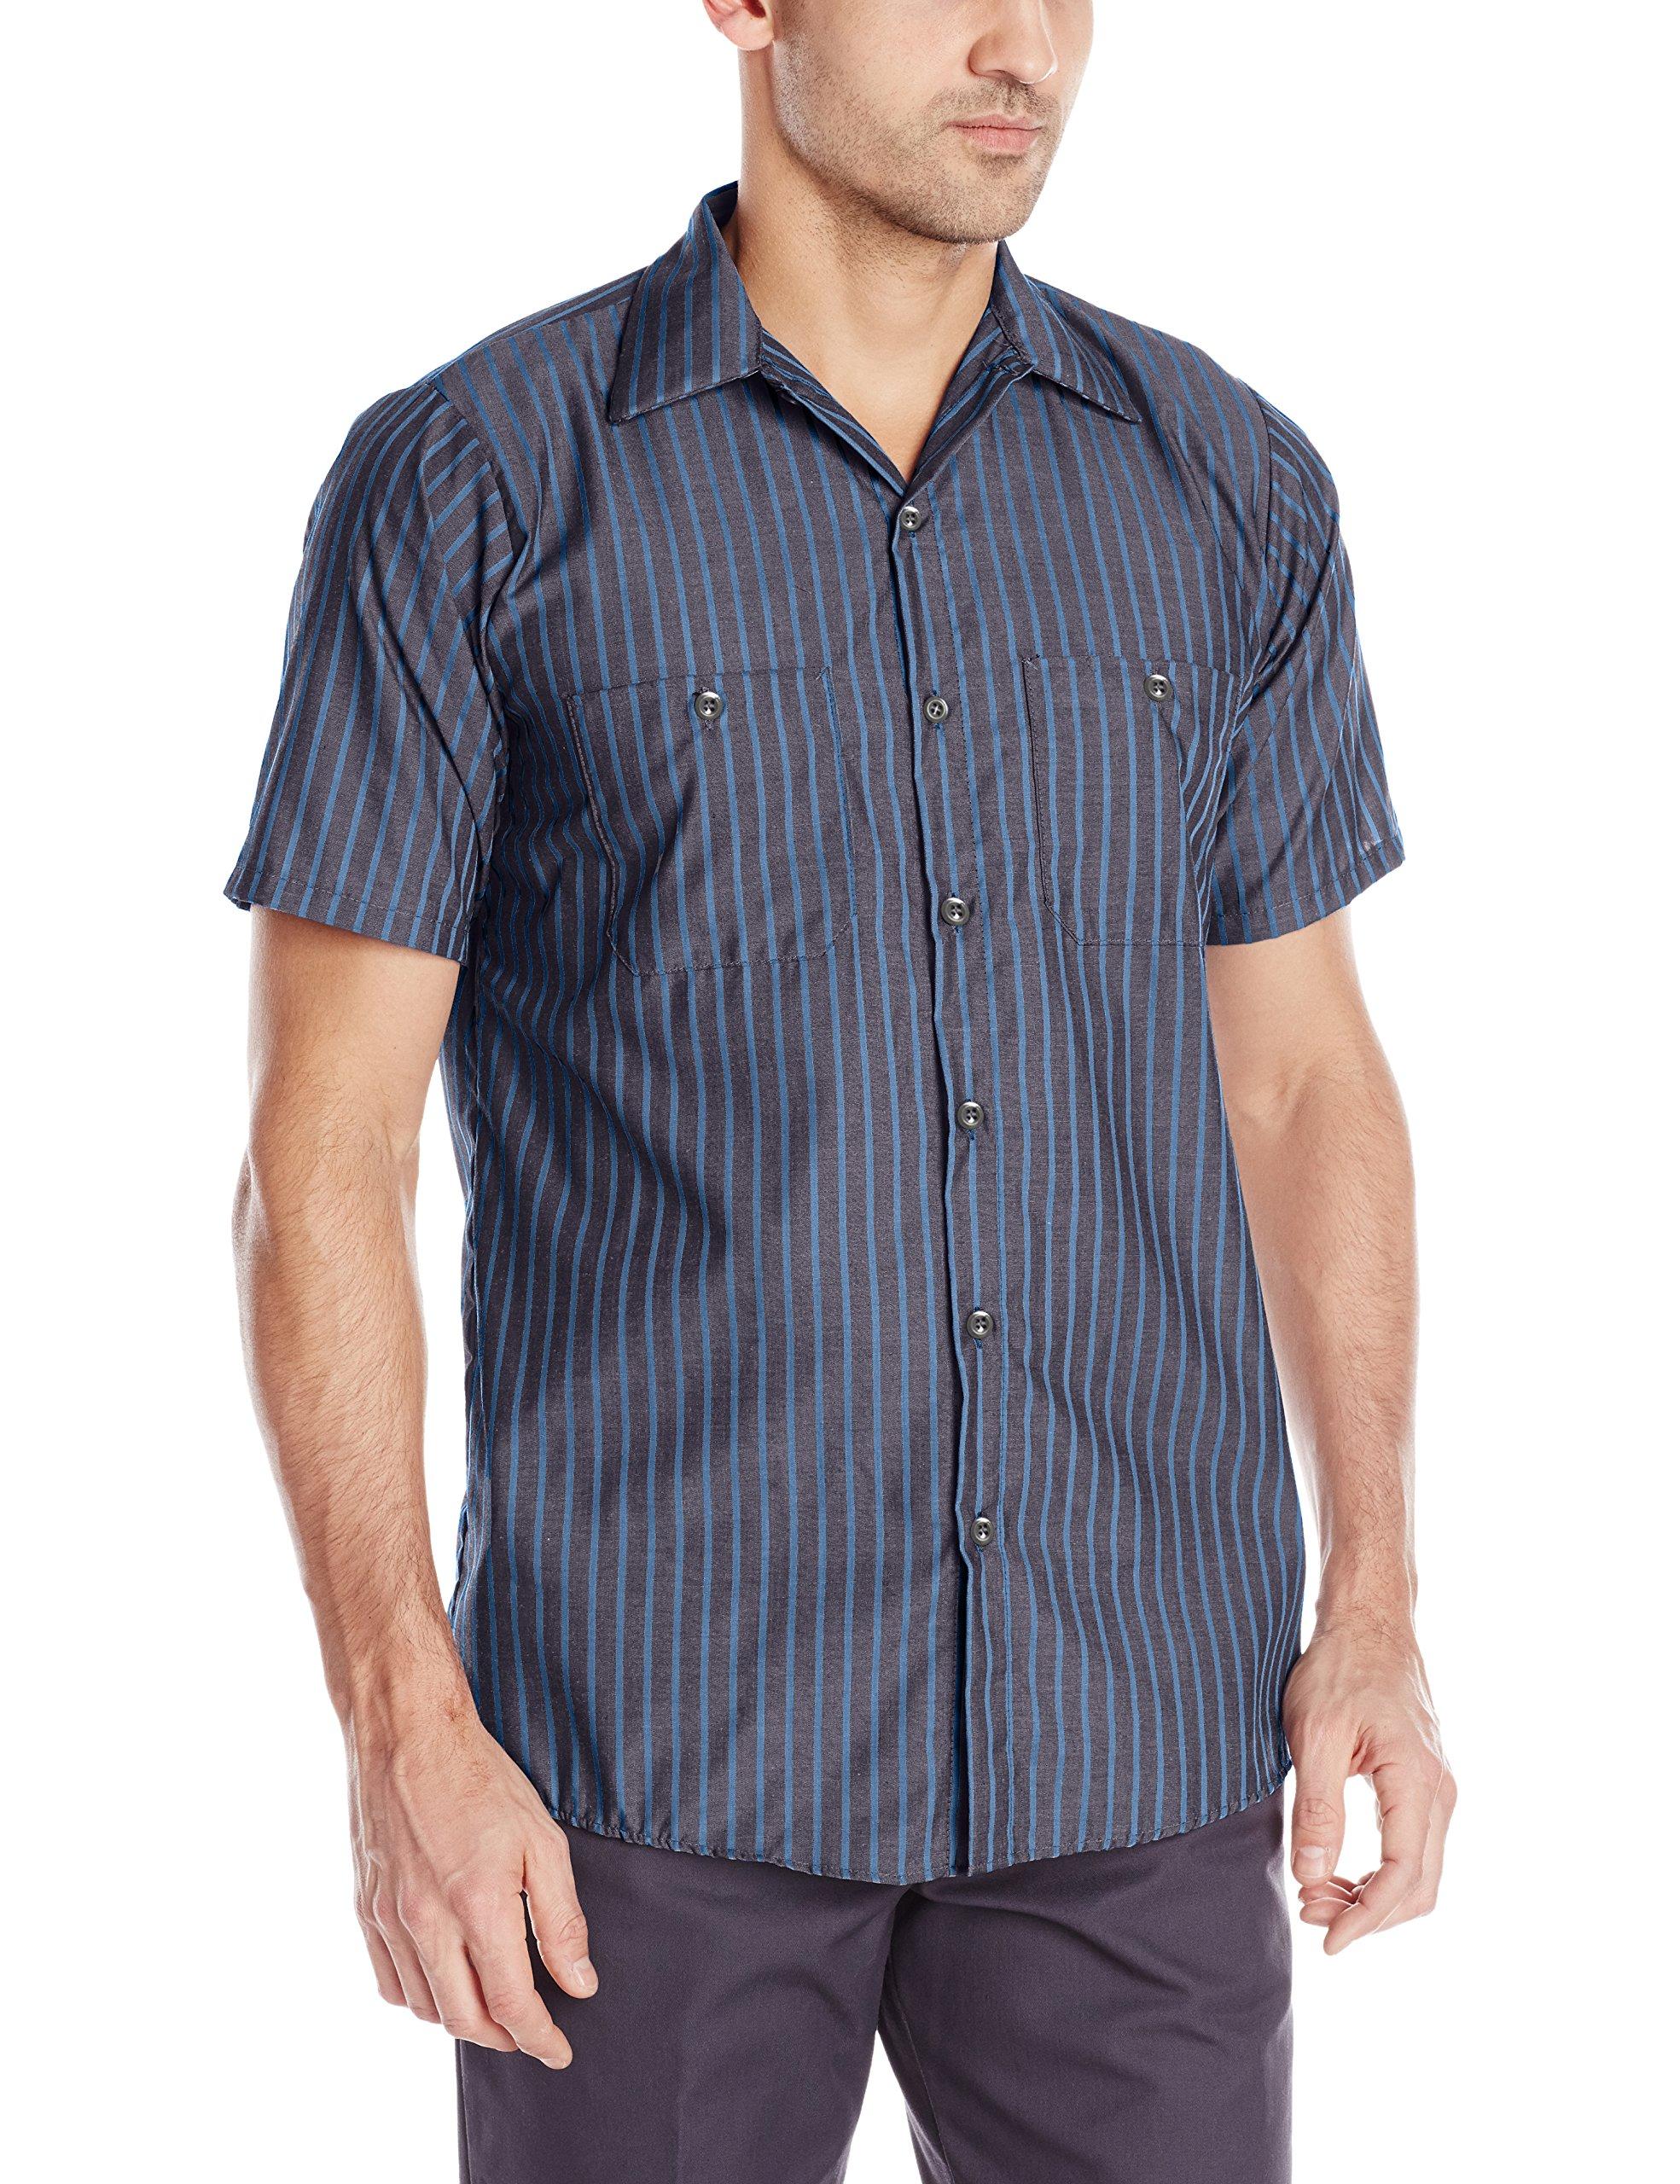 Red Kap Men's Industrial Stripe Work Shirt, Grey/Blue Stripe, Short Sleeve X-Large by Red Kap